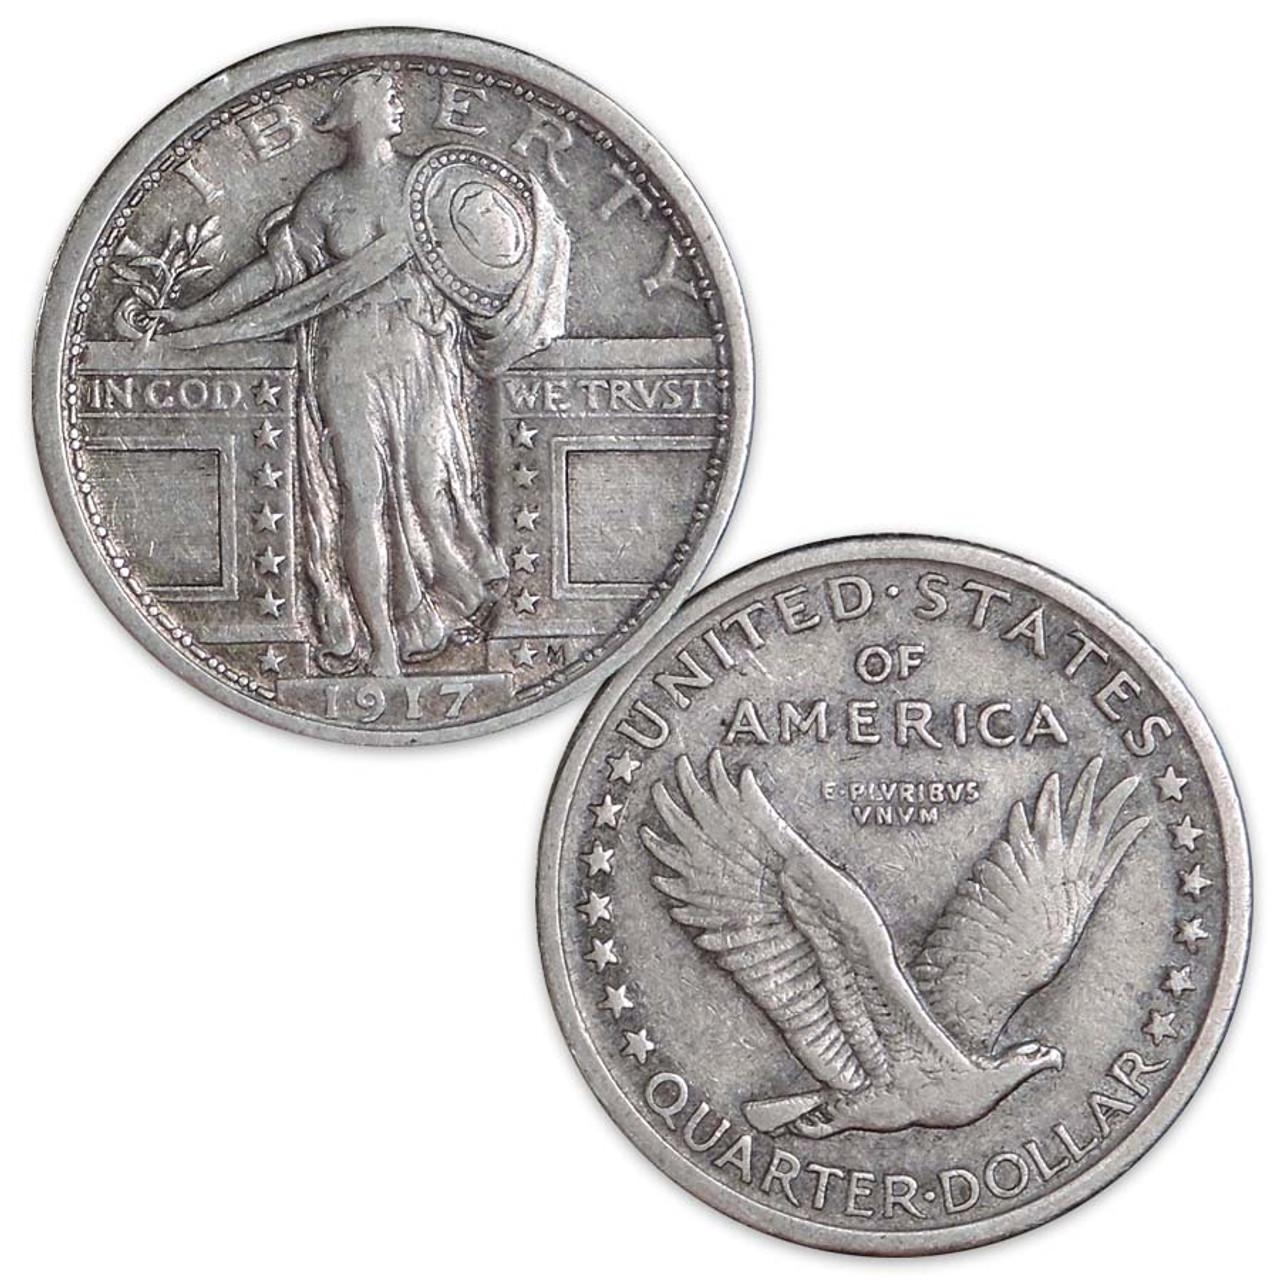 1917 Standing Liberty Quarter Type I Very Fine Image 1